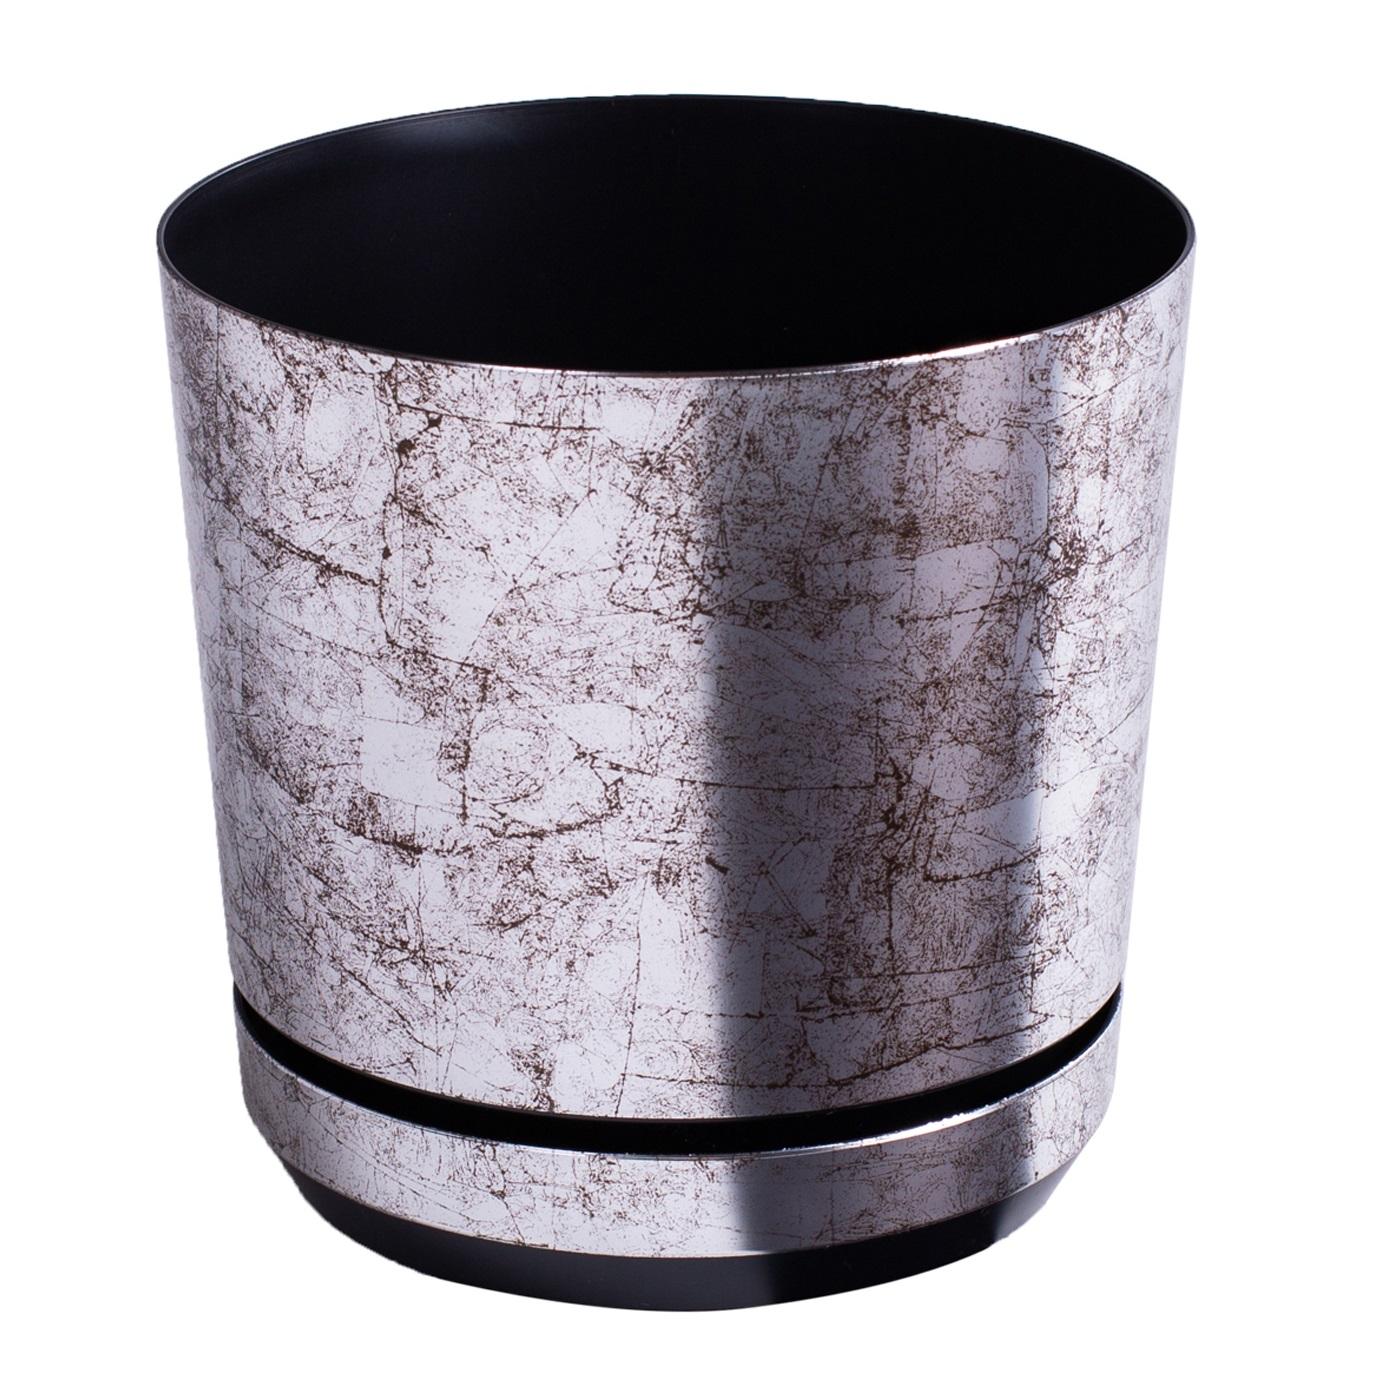 Doniczka okr±g³a Dekor - 12 cm - stare srebro